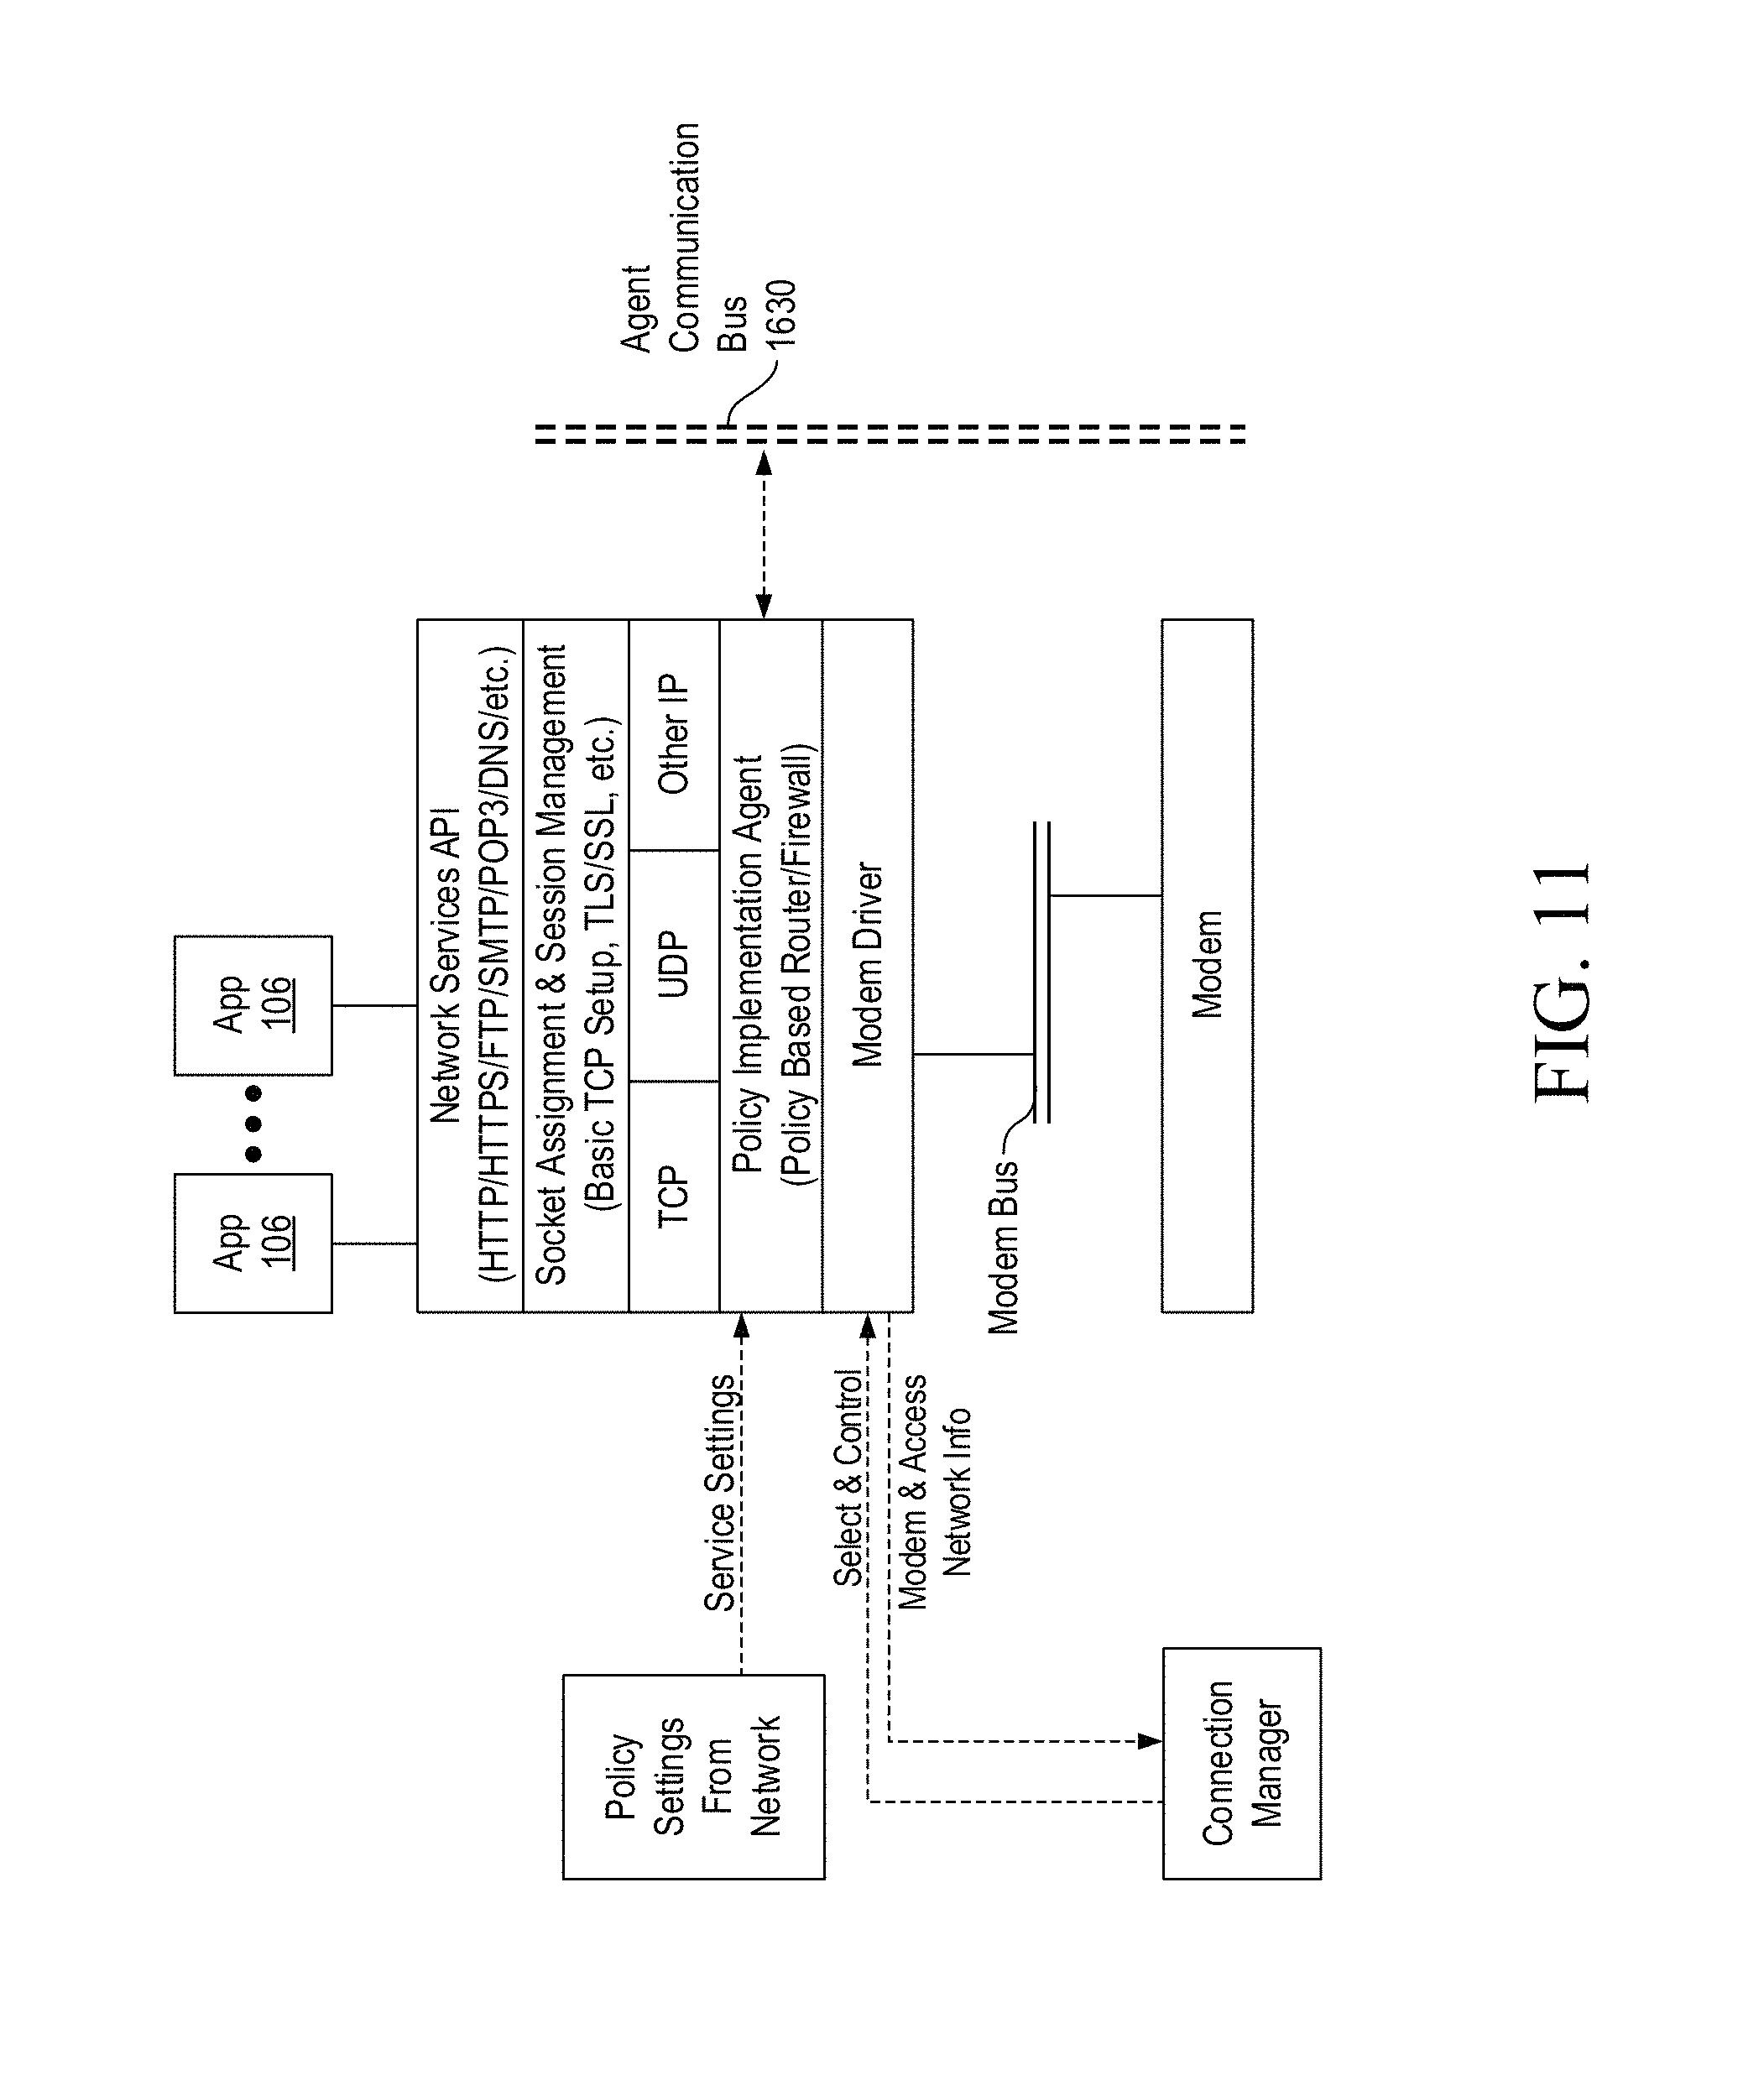 Patent Us 9955332 B2 Sandbox Free Download Wiring Diagrams Pictures Images